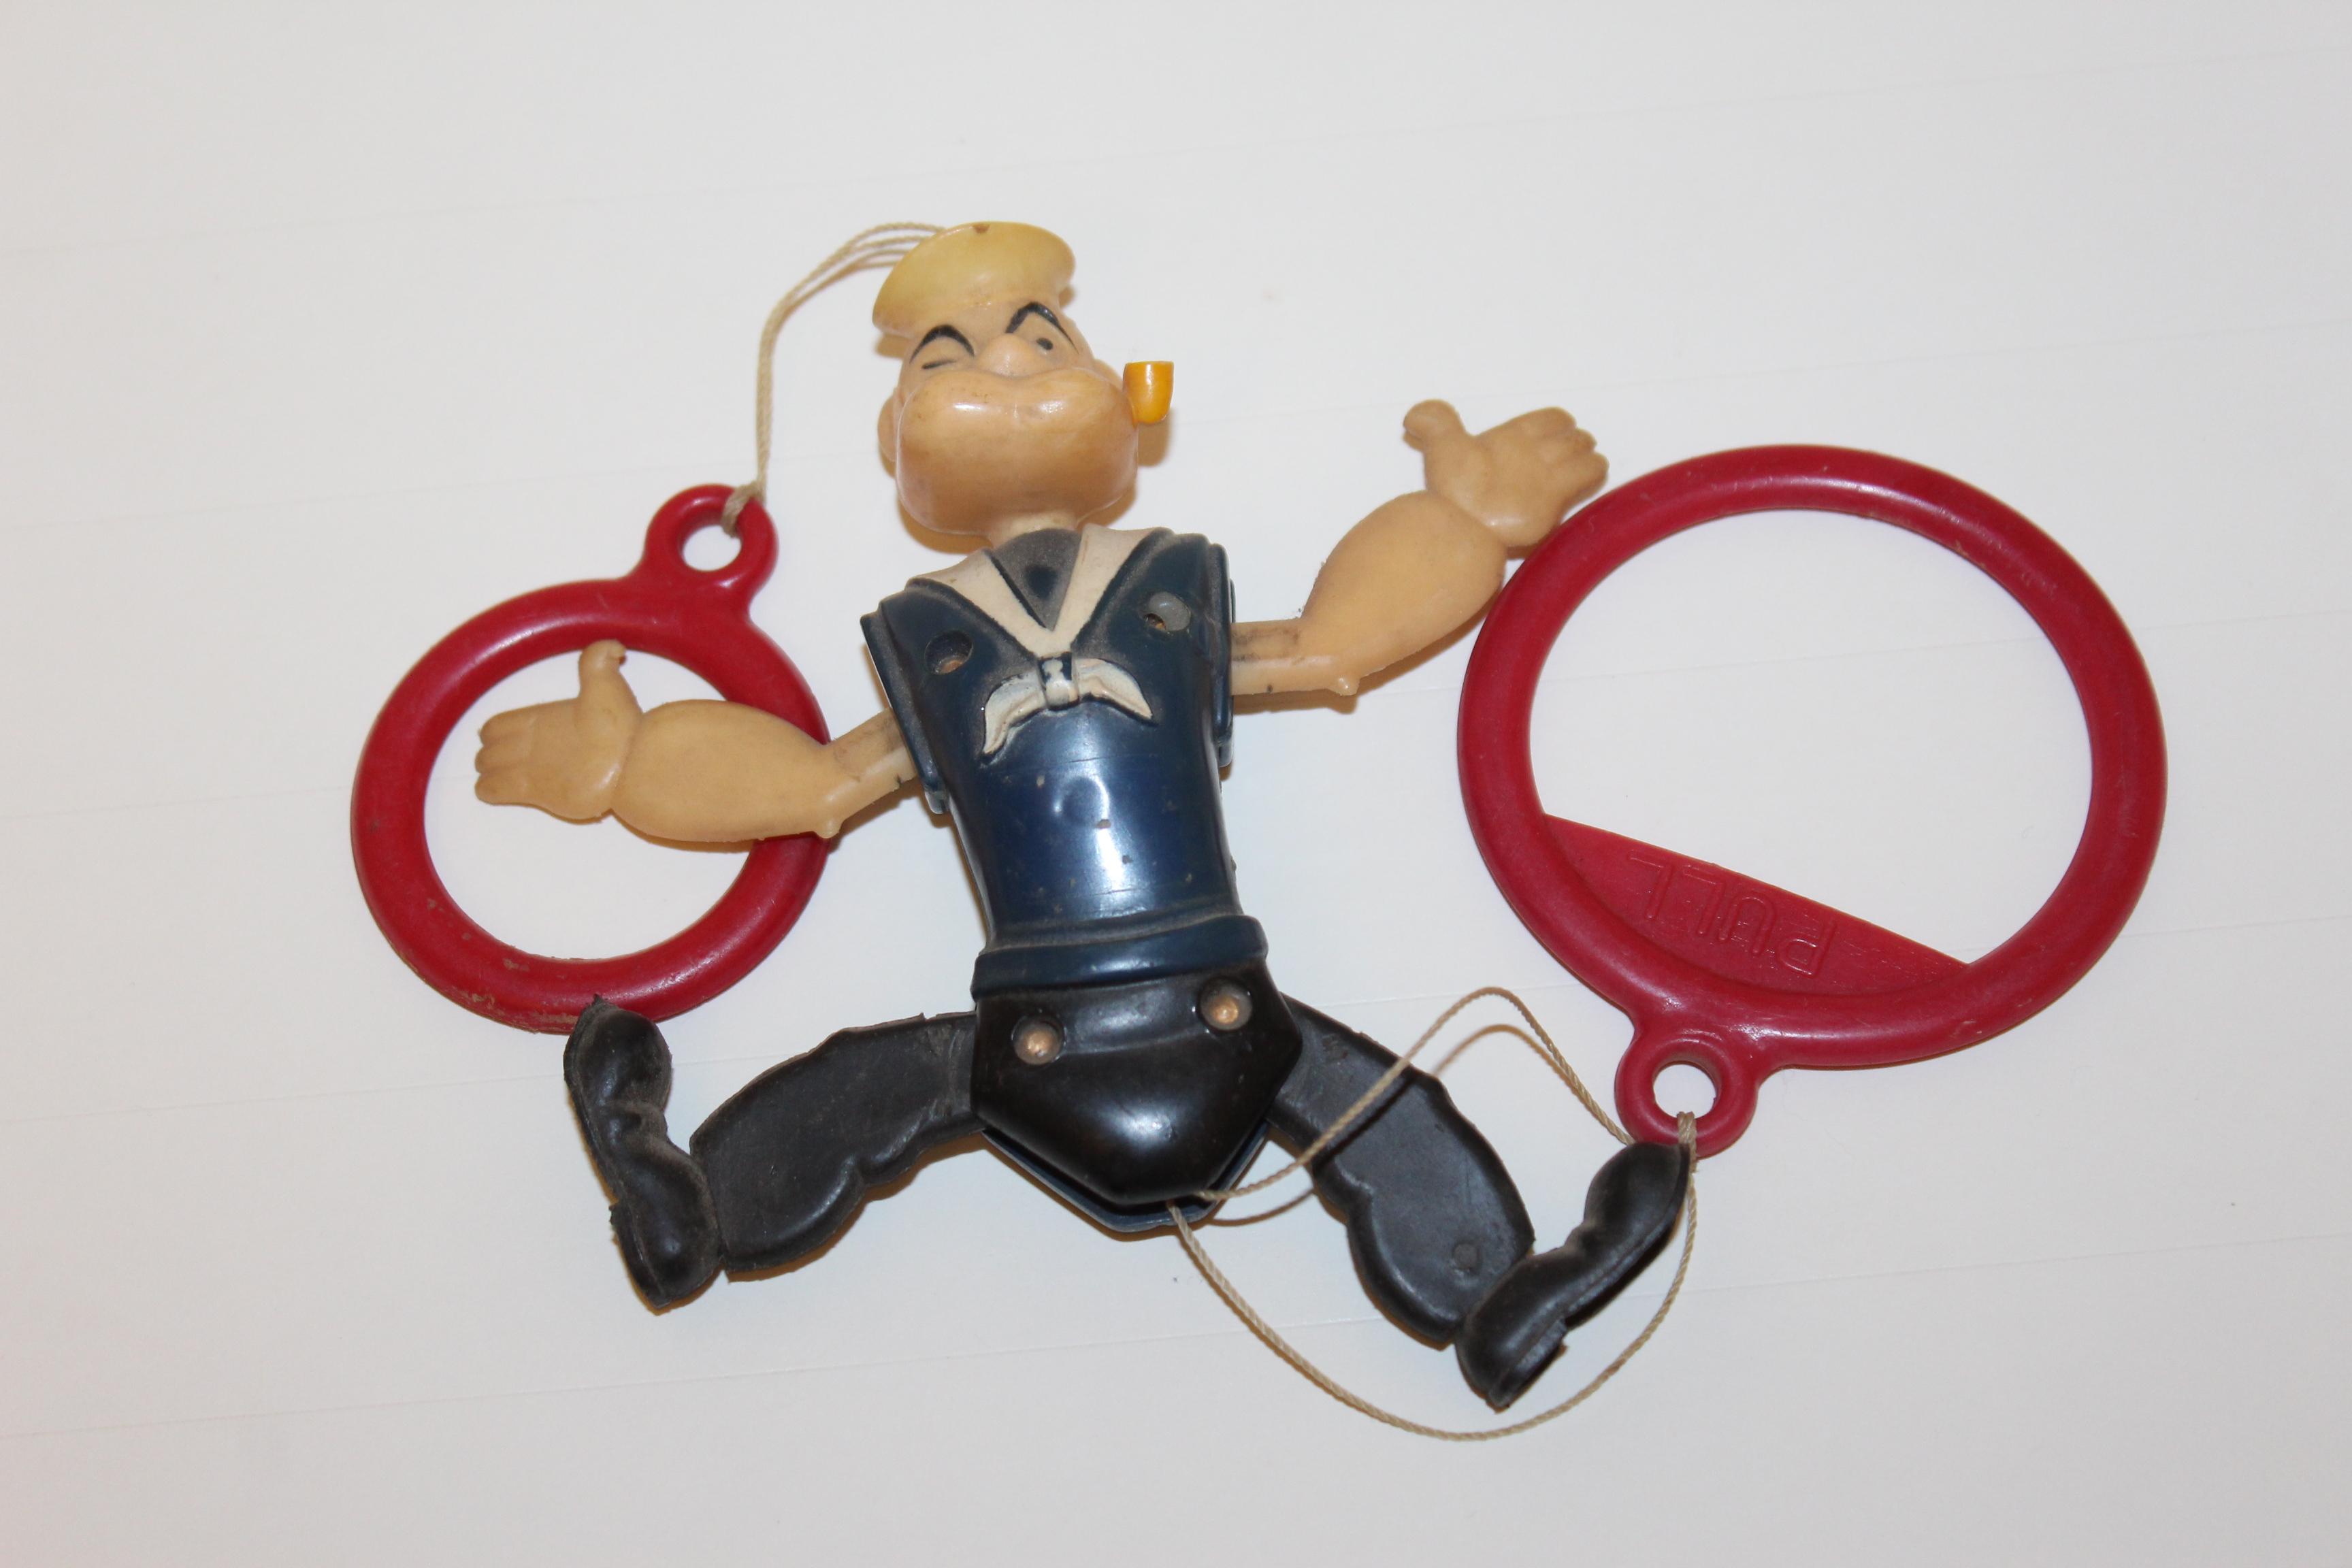 https://0201.nccdn.net/1_2/000/000/10a/7ab/Popeye-acrobate.JPG